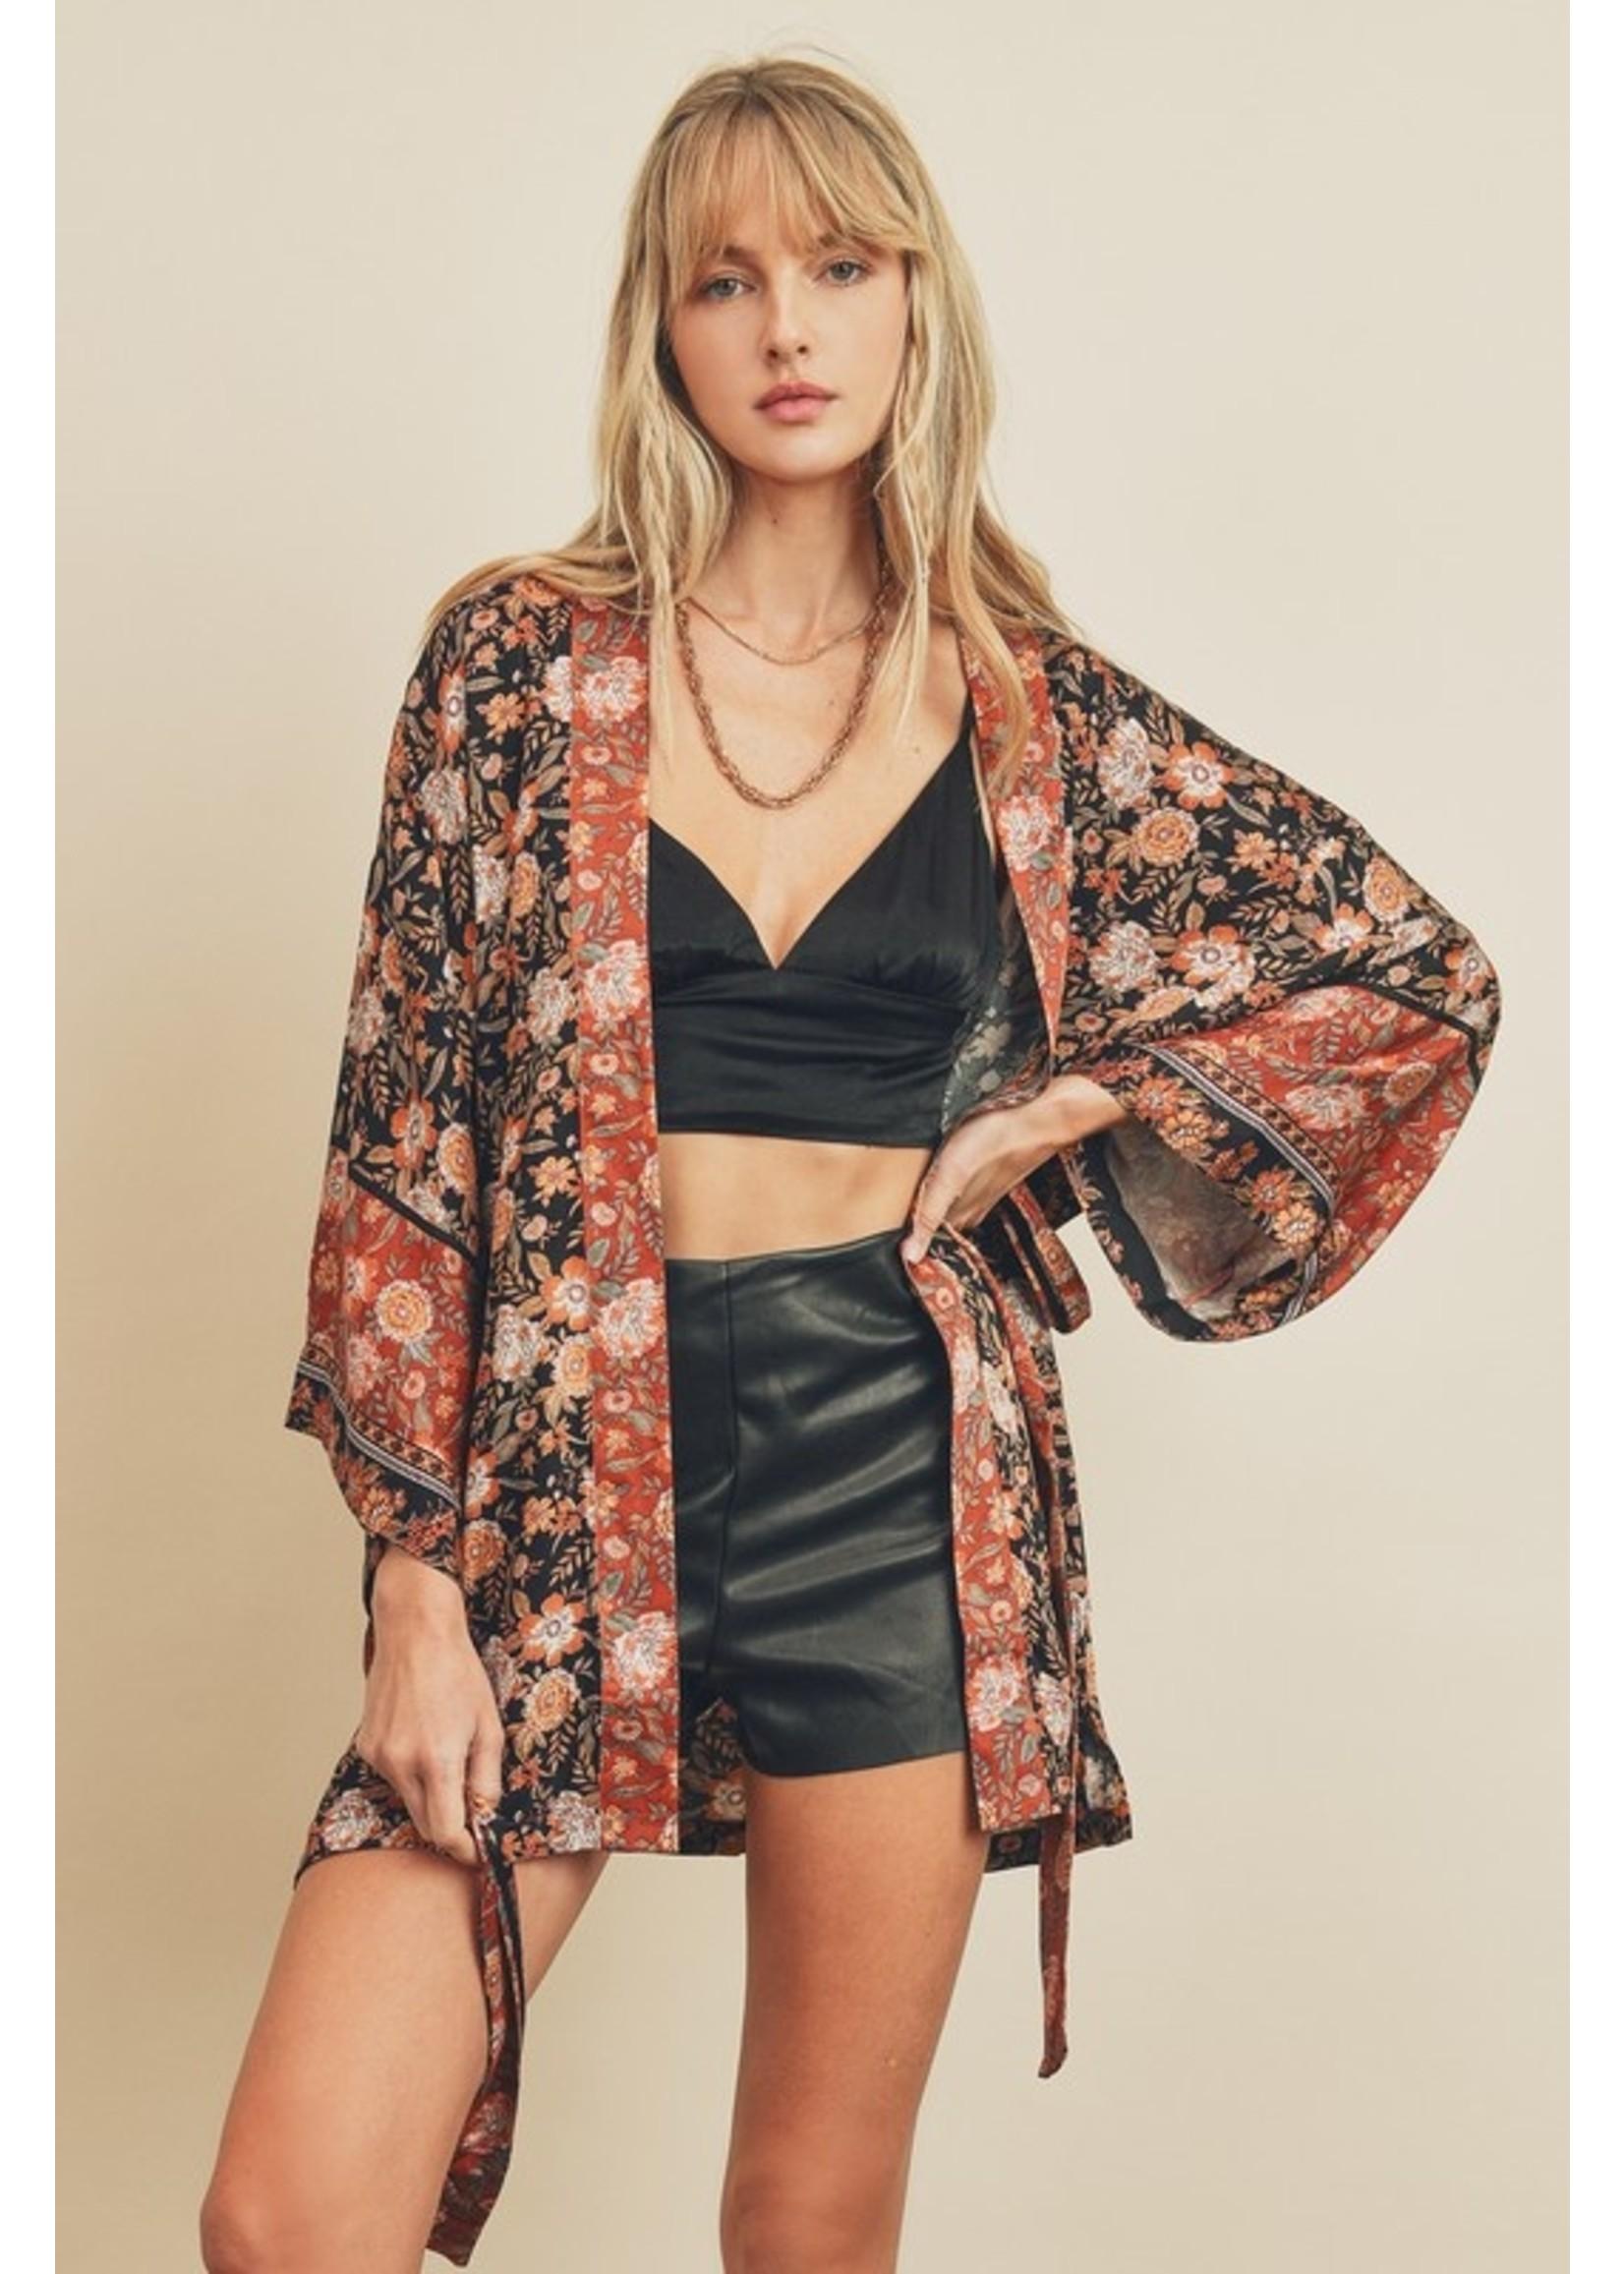 Dress Forum Wrap Me Up Kimono Black